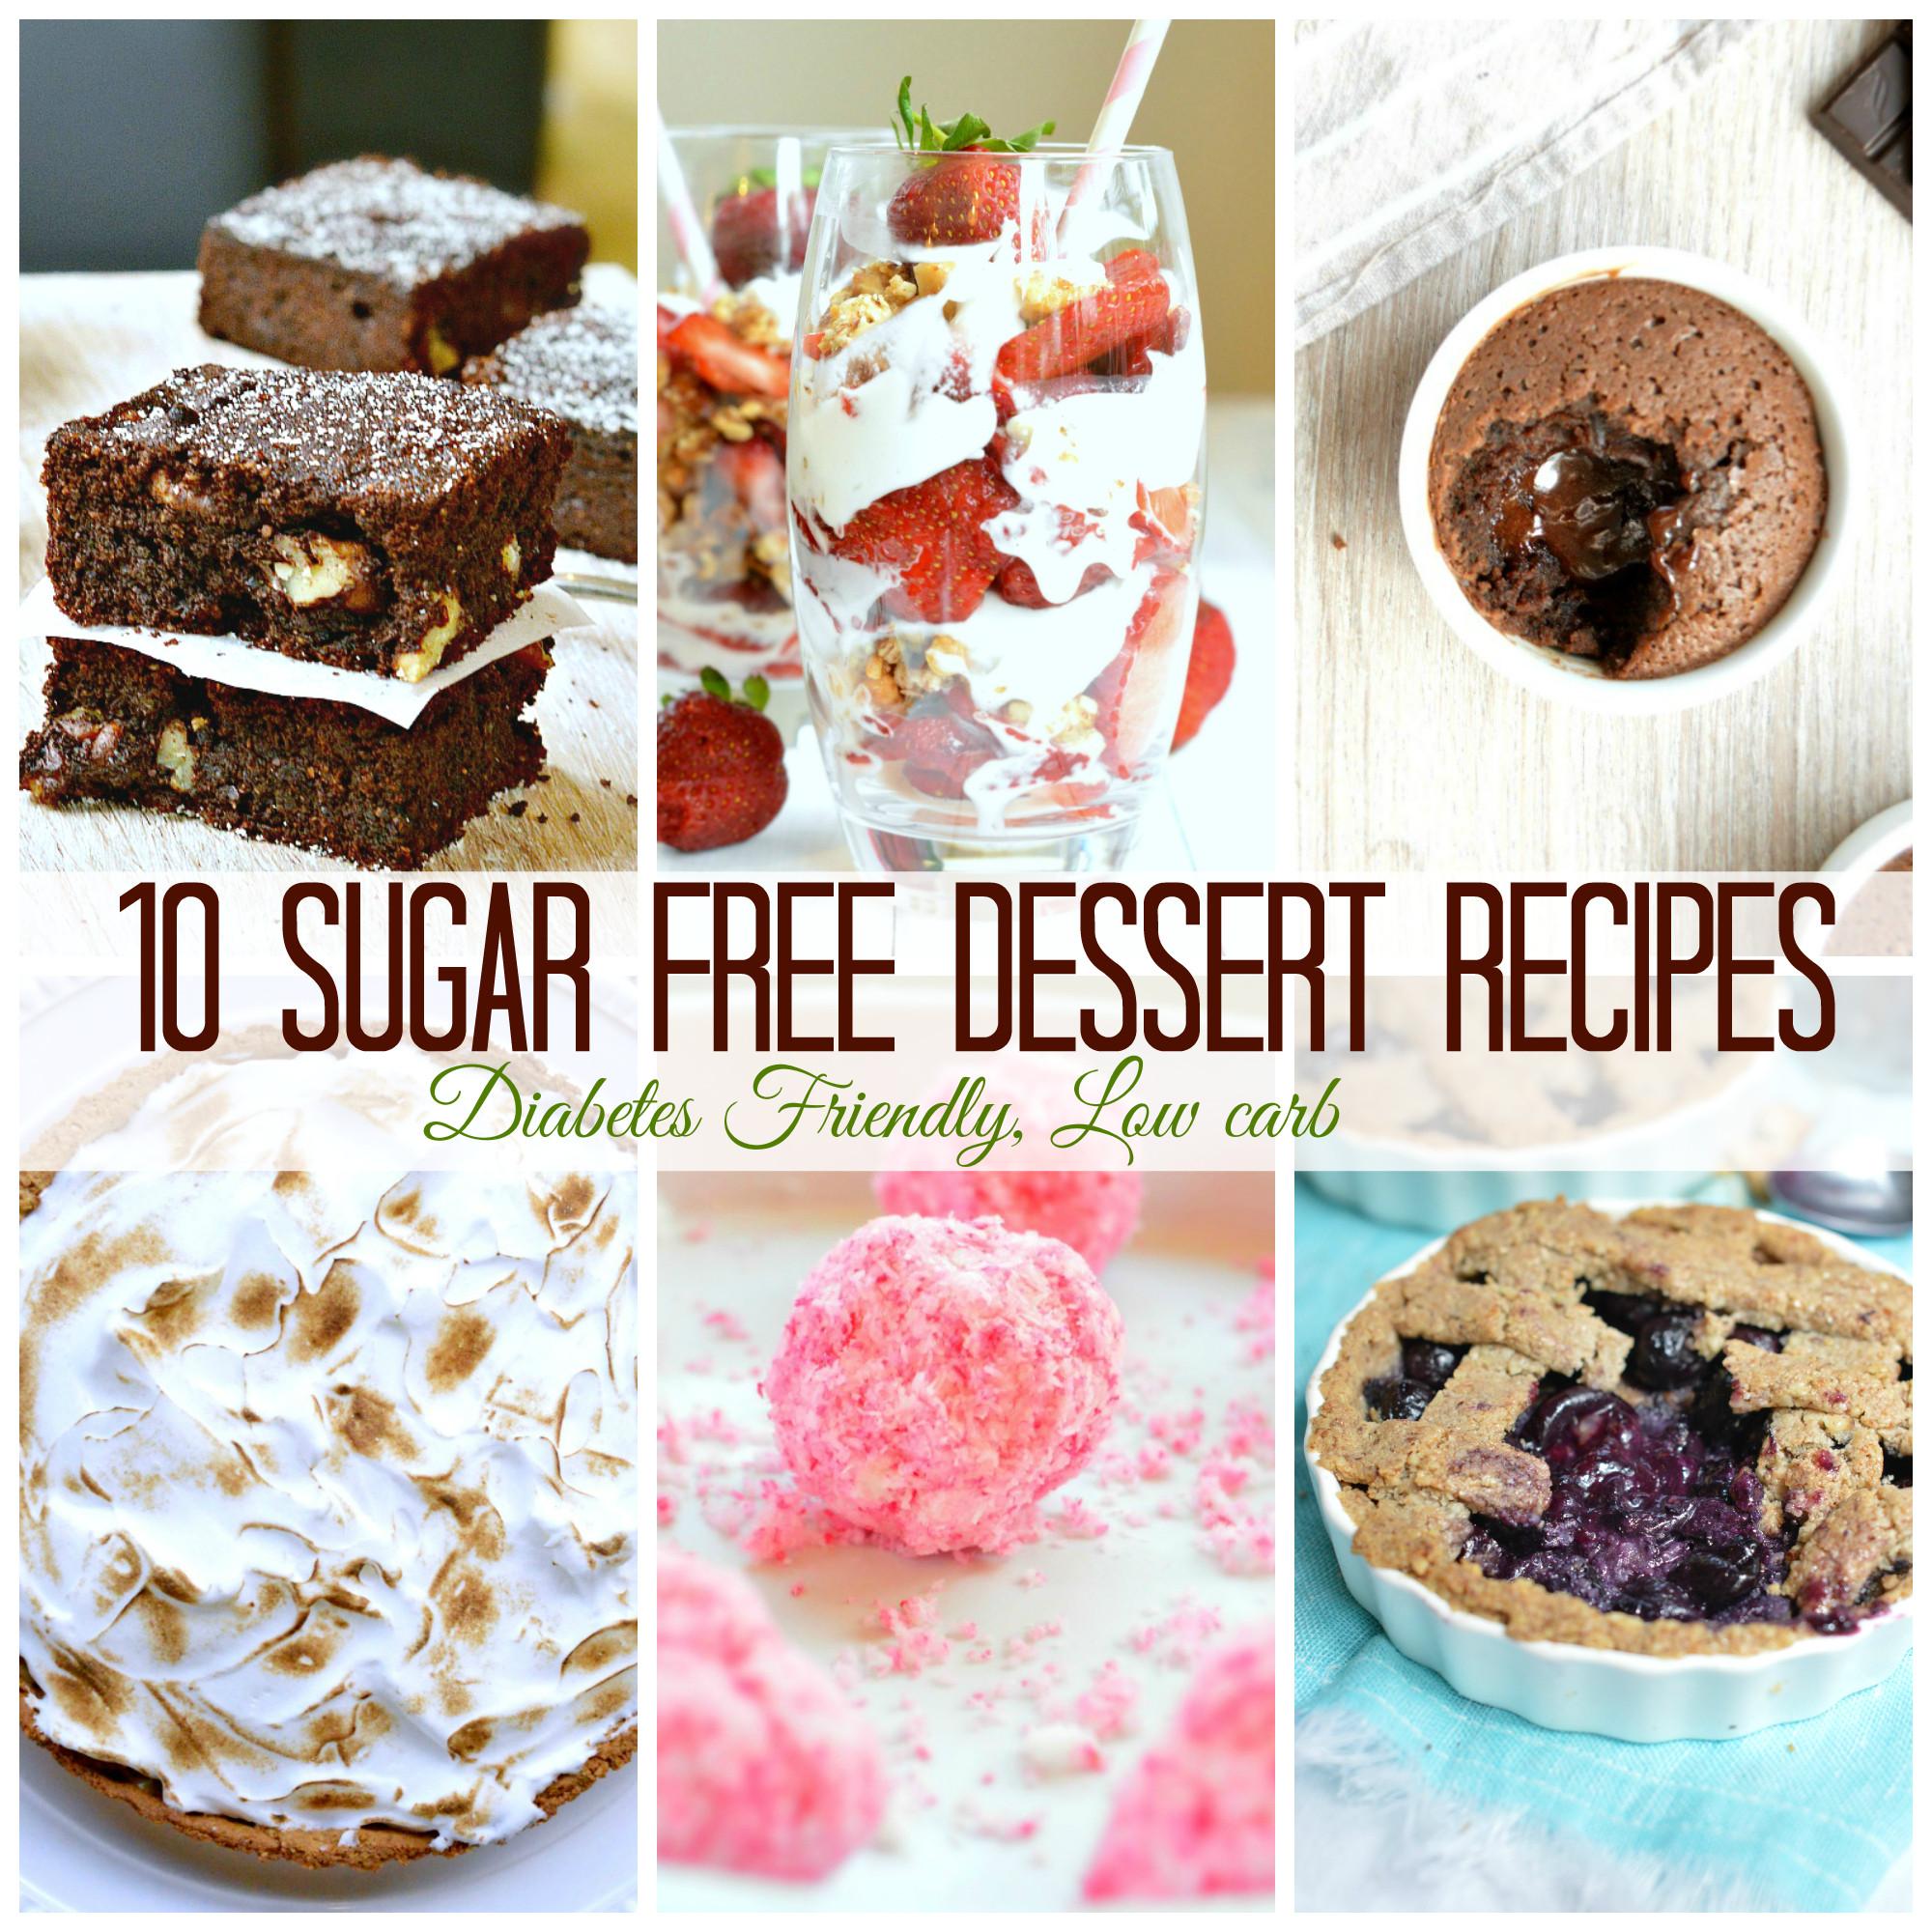 Healthy Desserts For Diabetics  10 Sugar Free Dessert for diabetics SWEETASHONEY